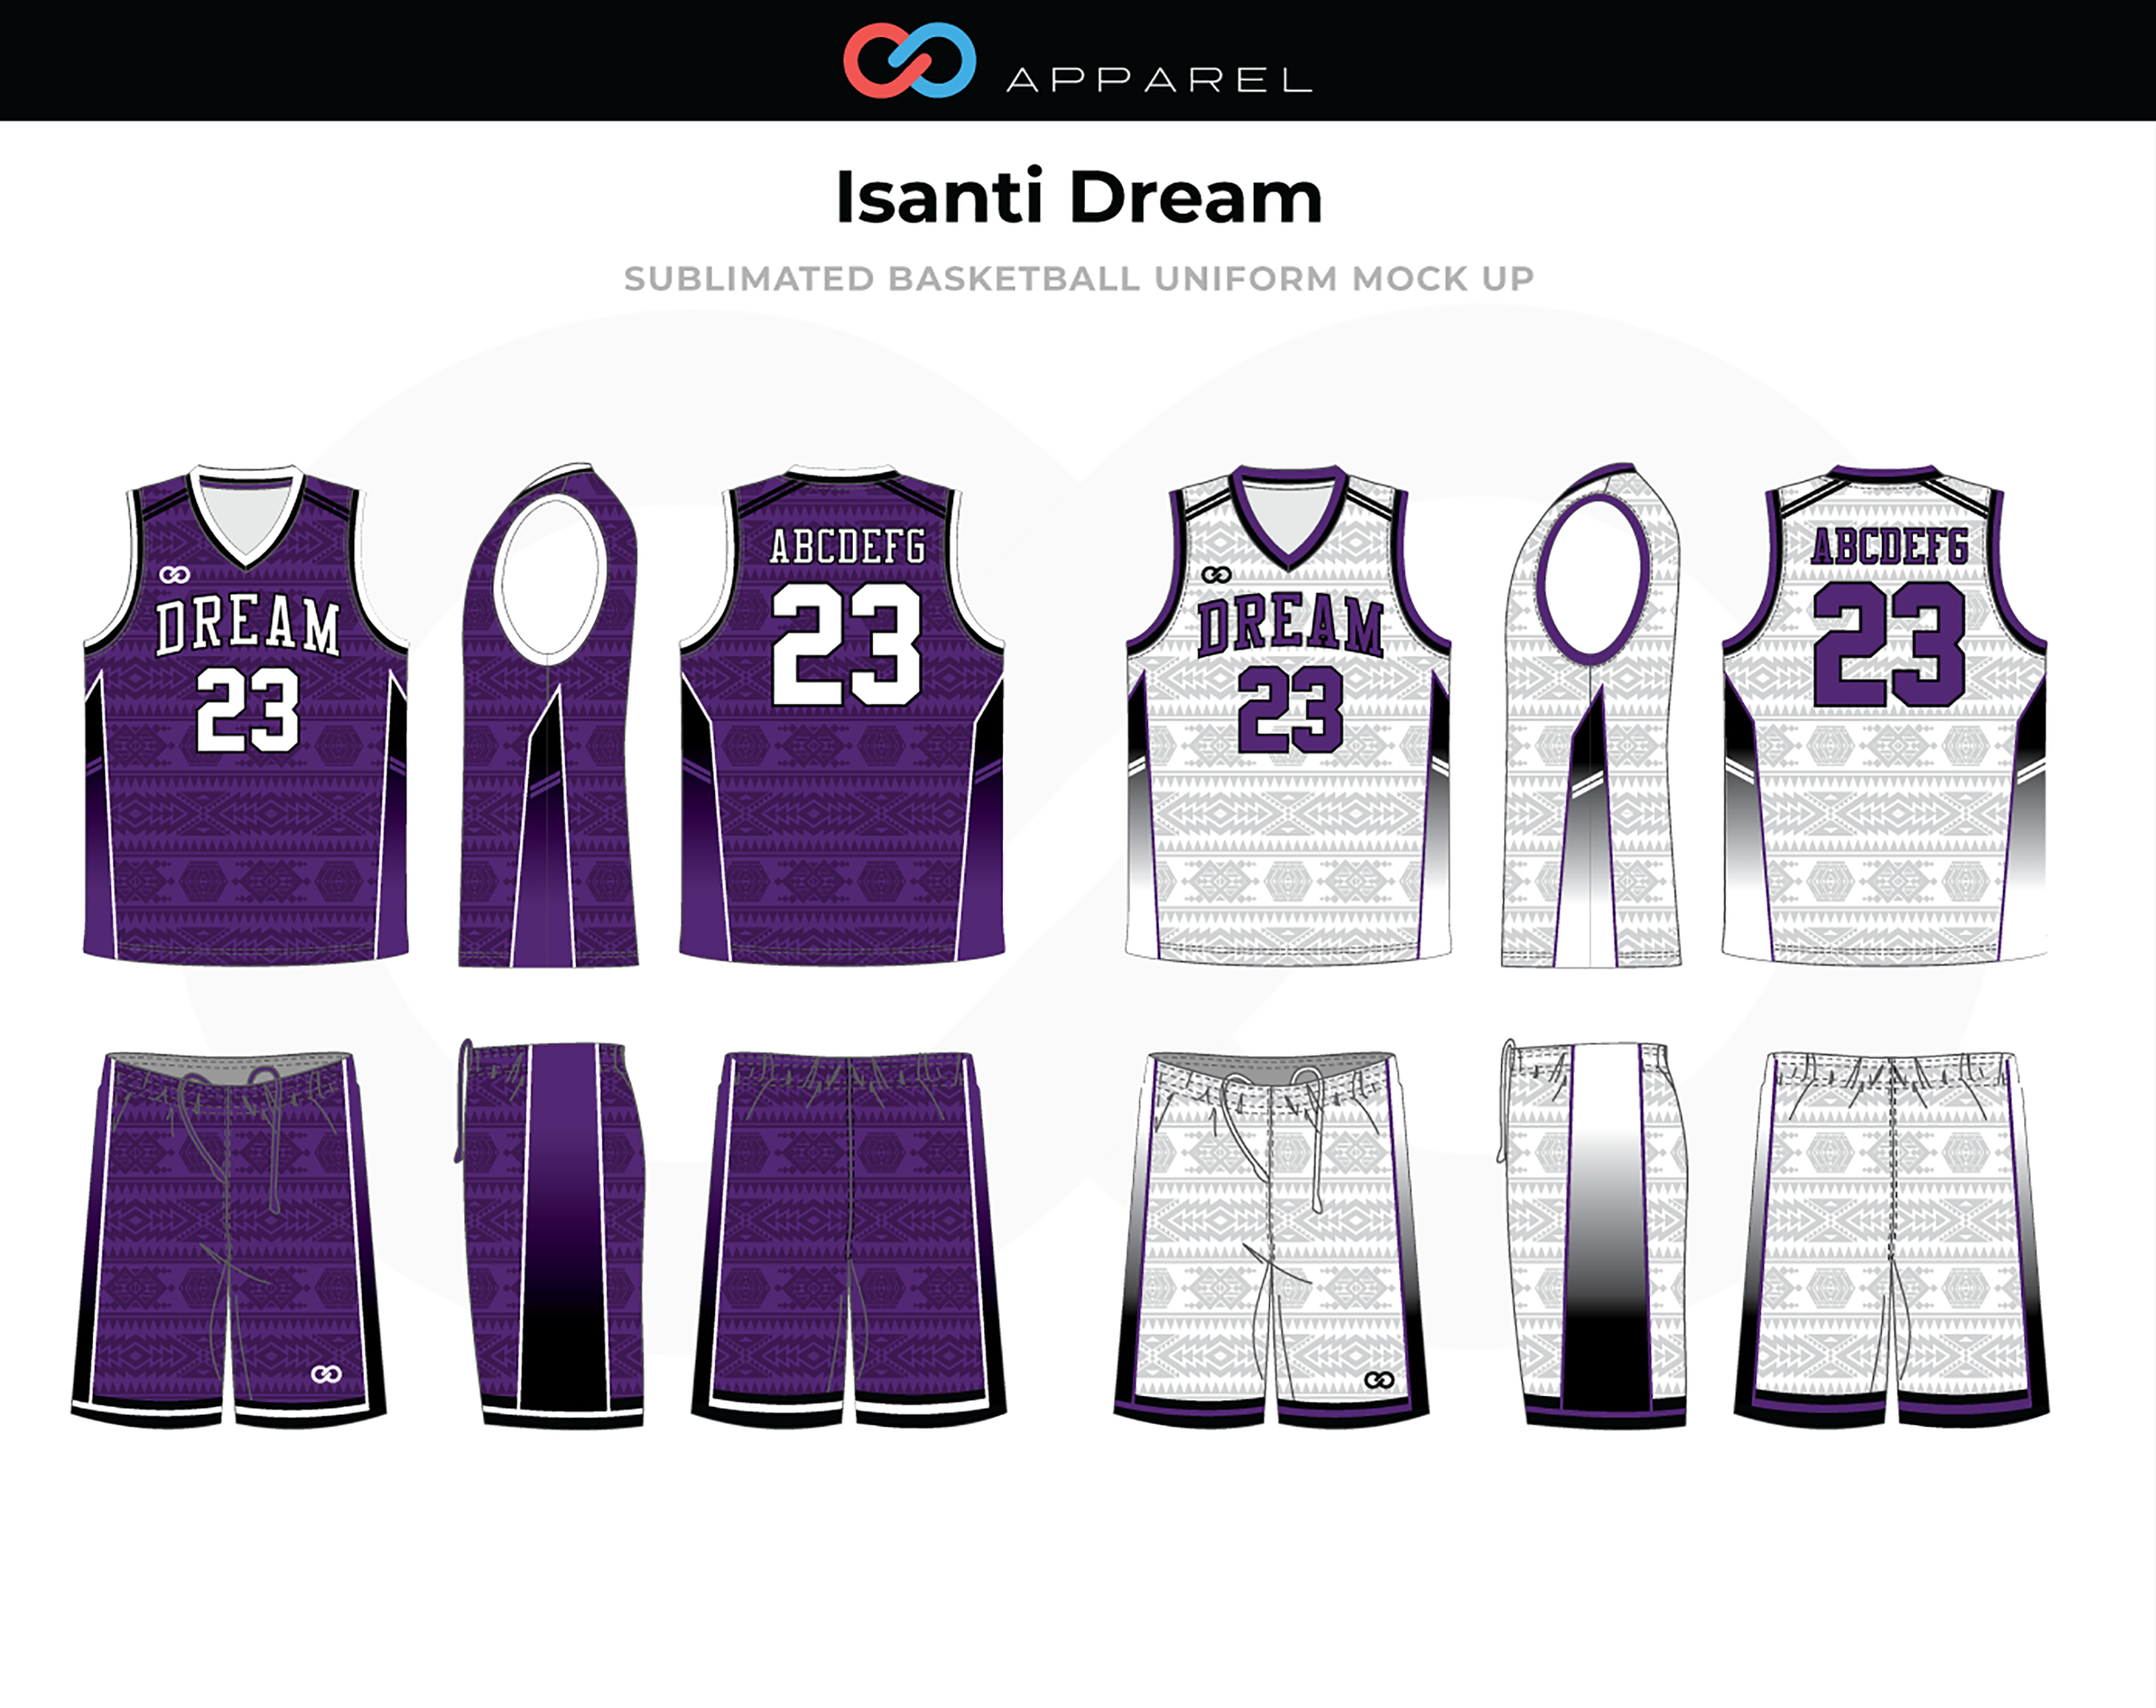 ISANTI DREAM Purple White Black Basketball Uniform, Jersey and Shorts